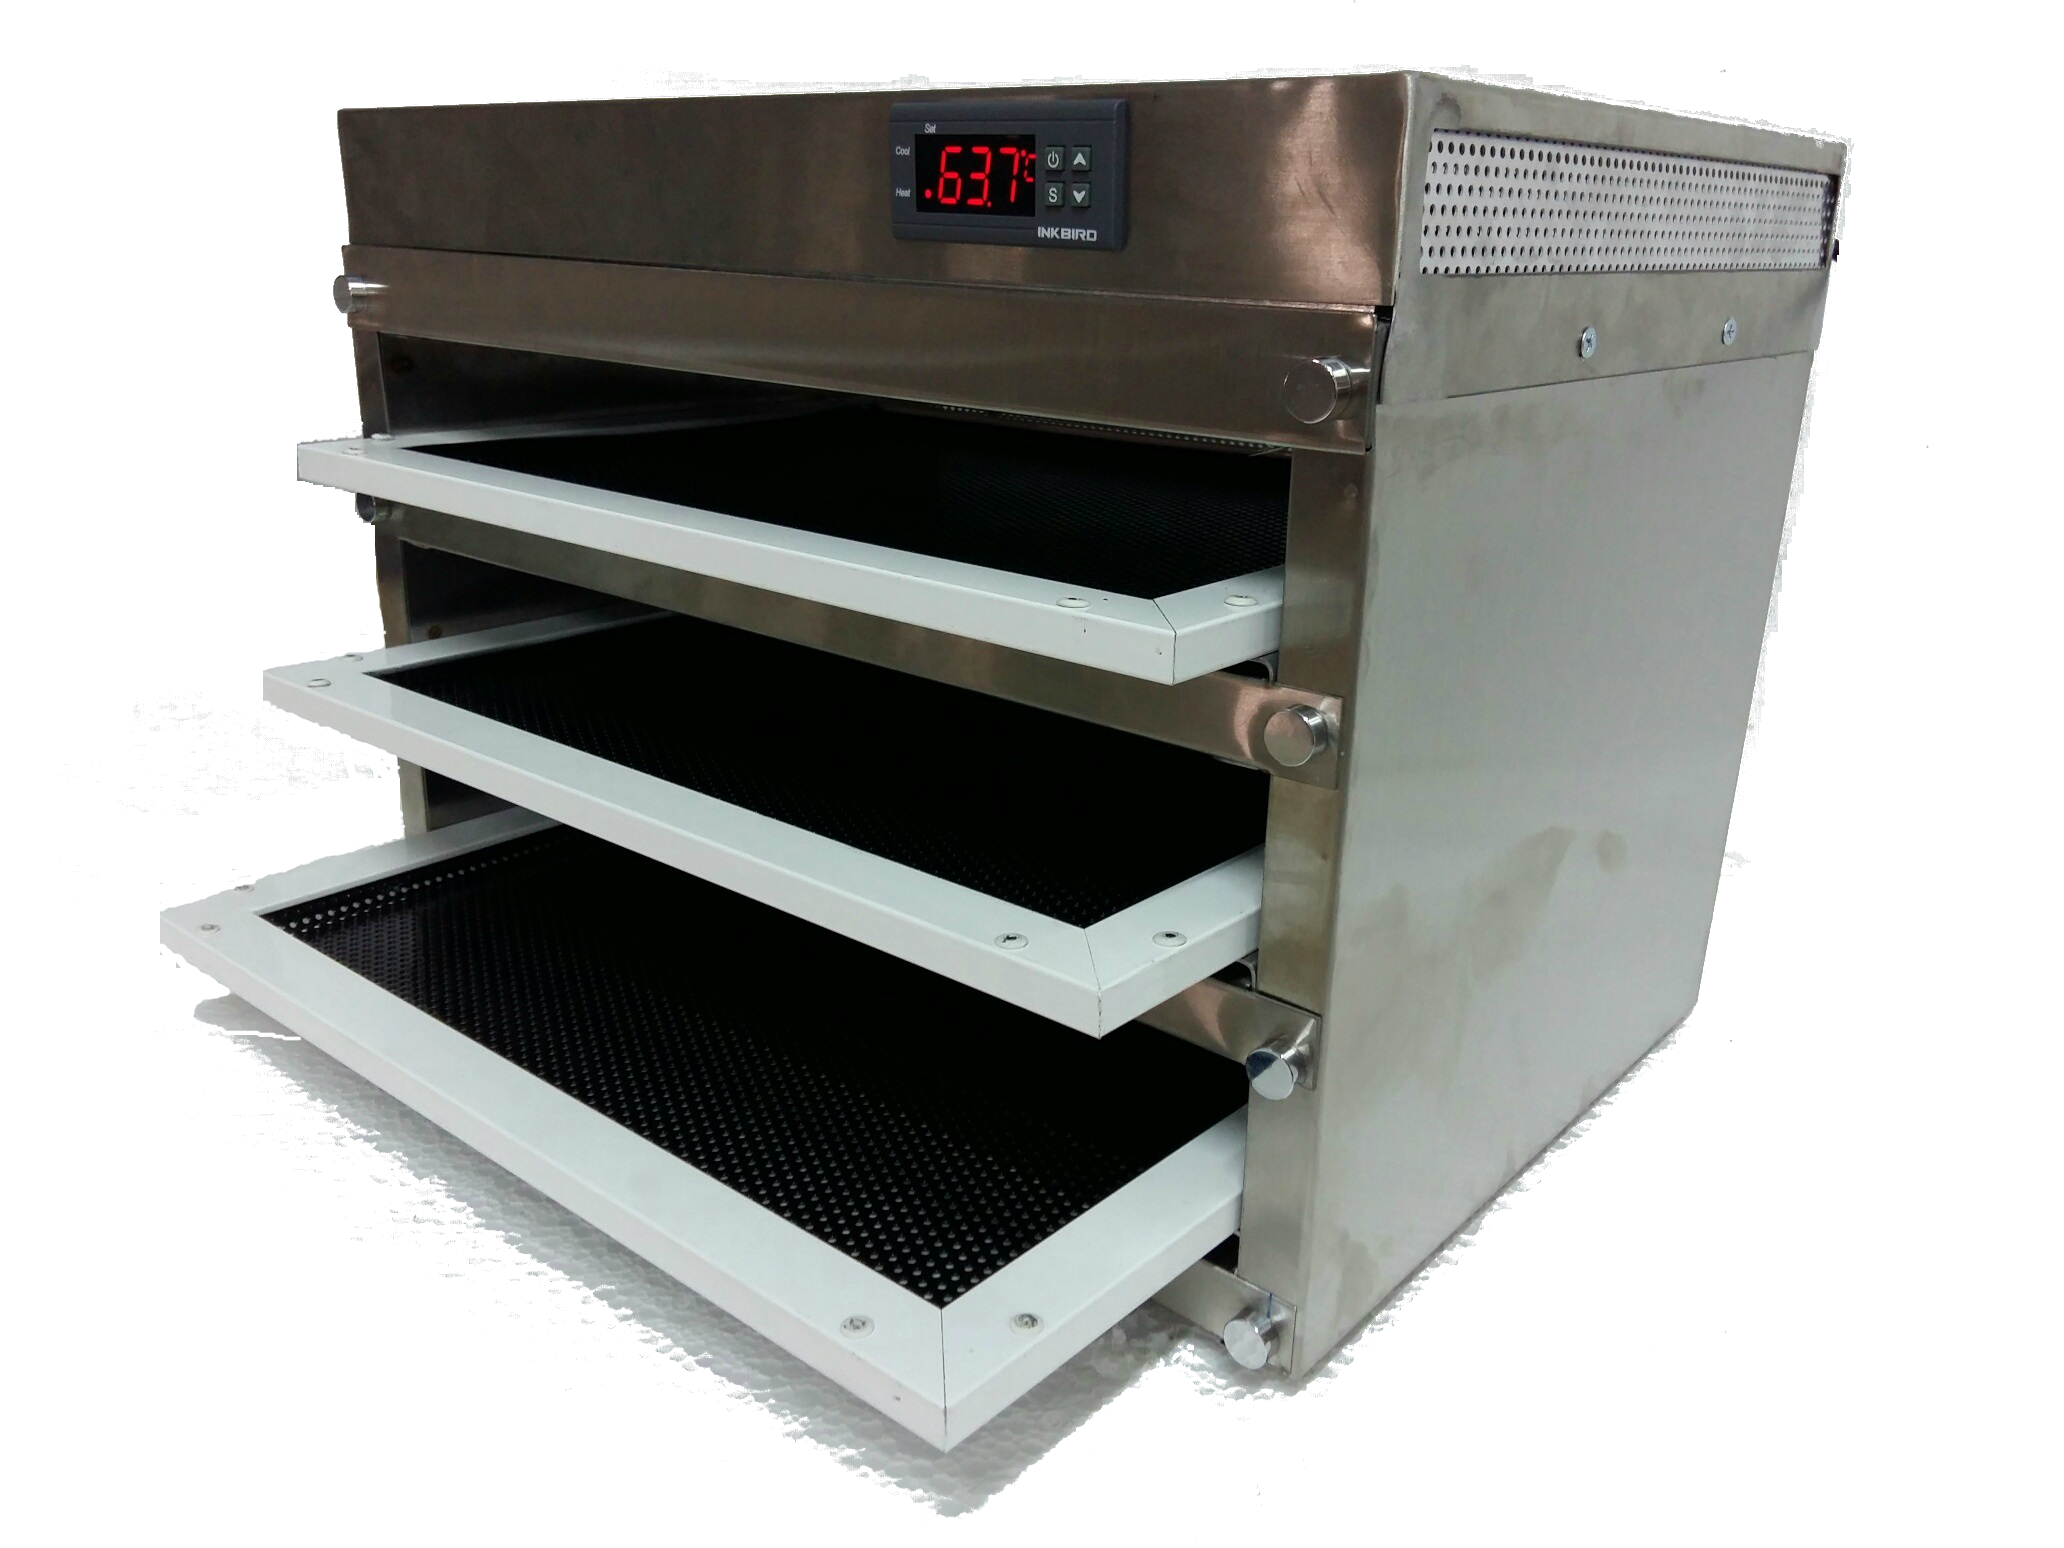 Deshidratador doméstico FIR y calentador de platos